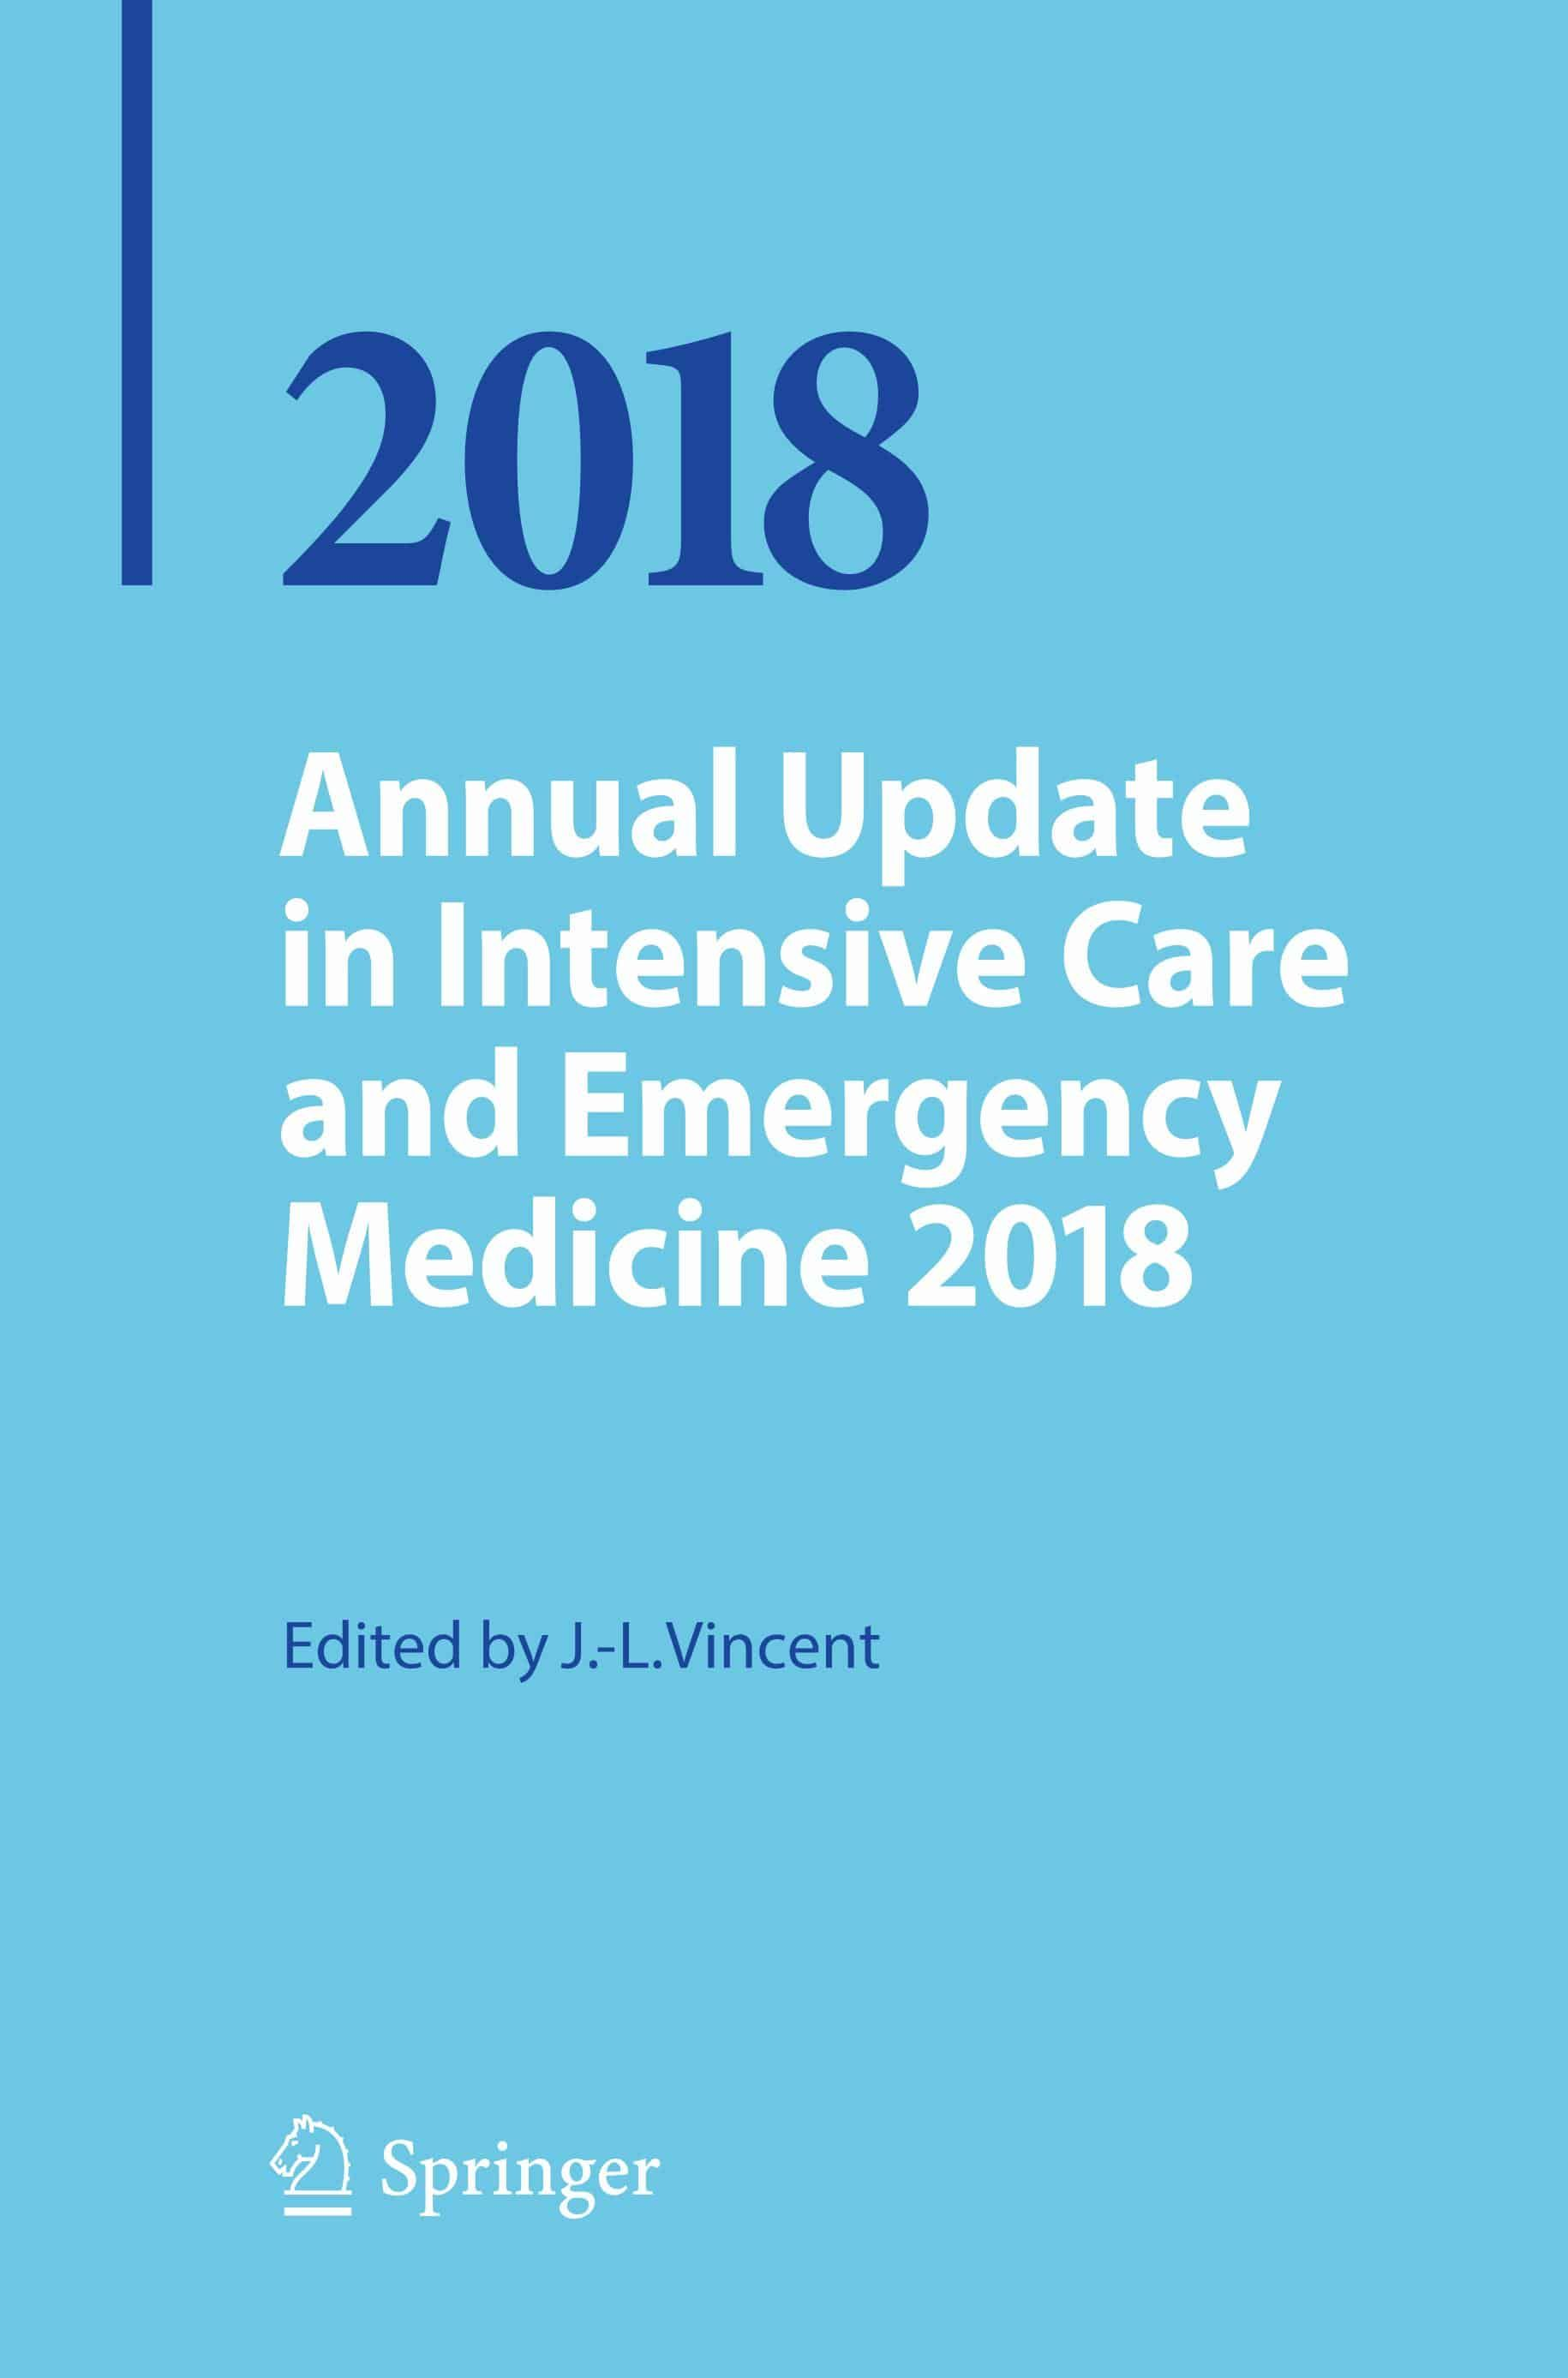 Annual Update in Intensive Care and Emergency Medicine, 2018